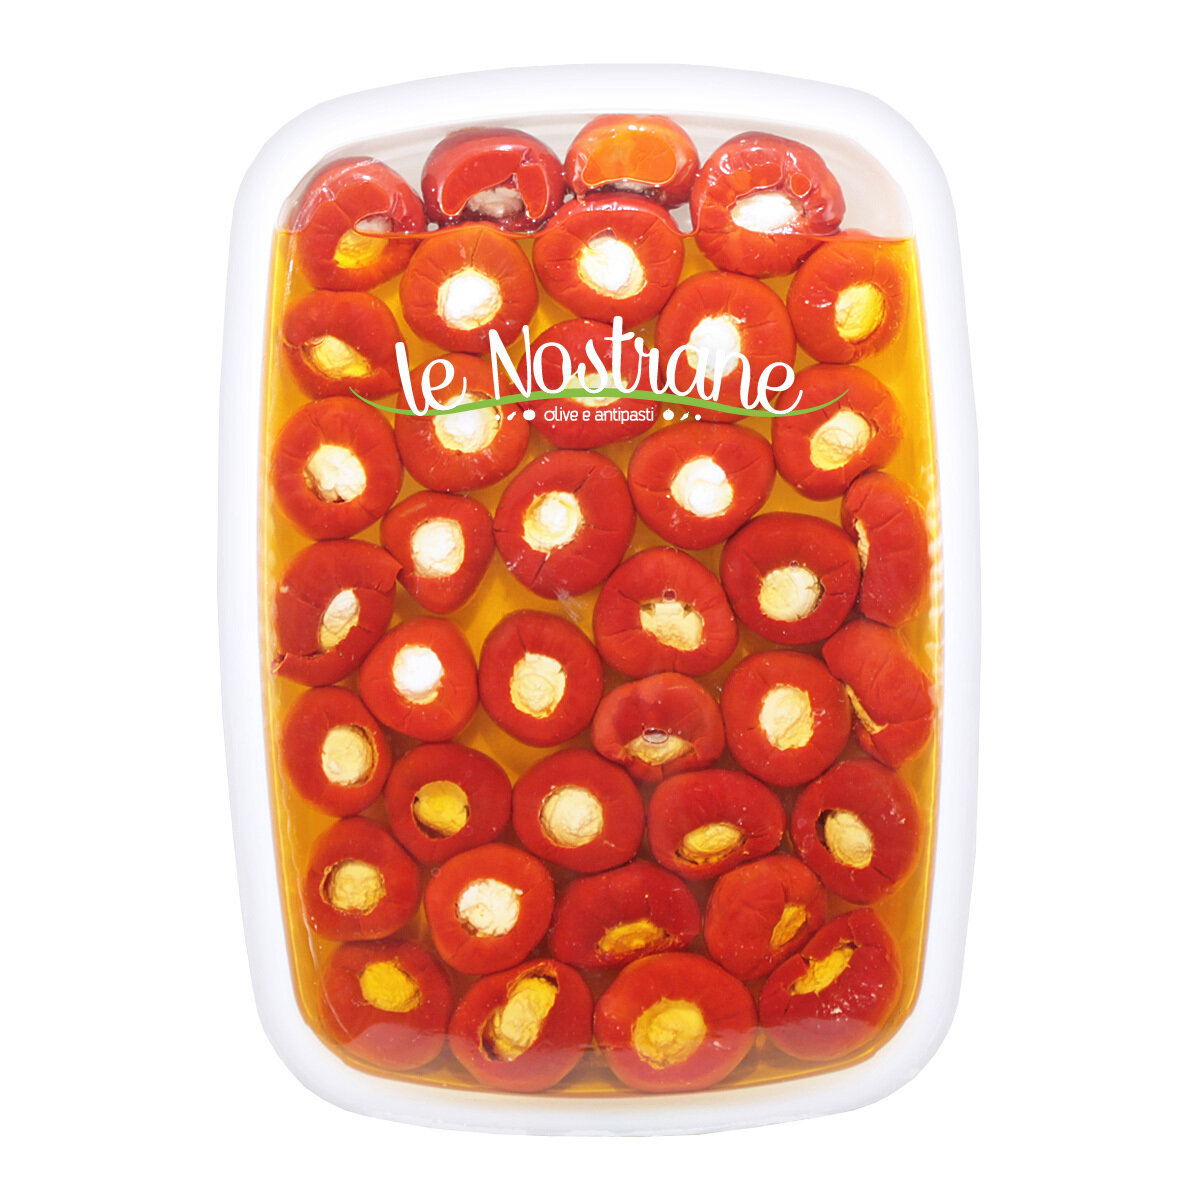 Vuohenjuustolla Täytetty Pippuri | Caprino Filled Pepper | LE NOSTRANE | 1 KG